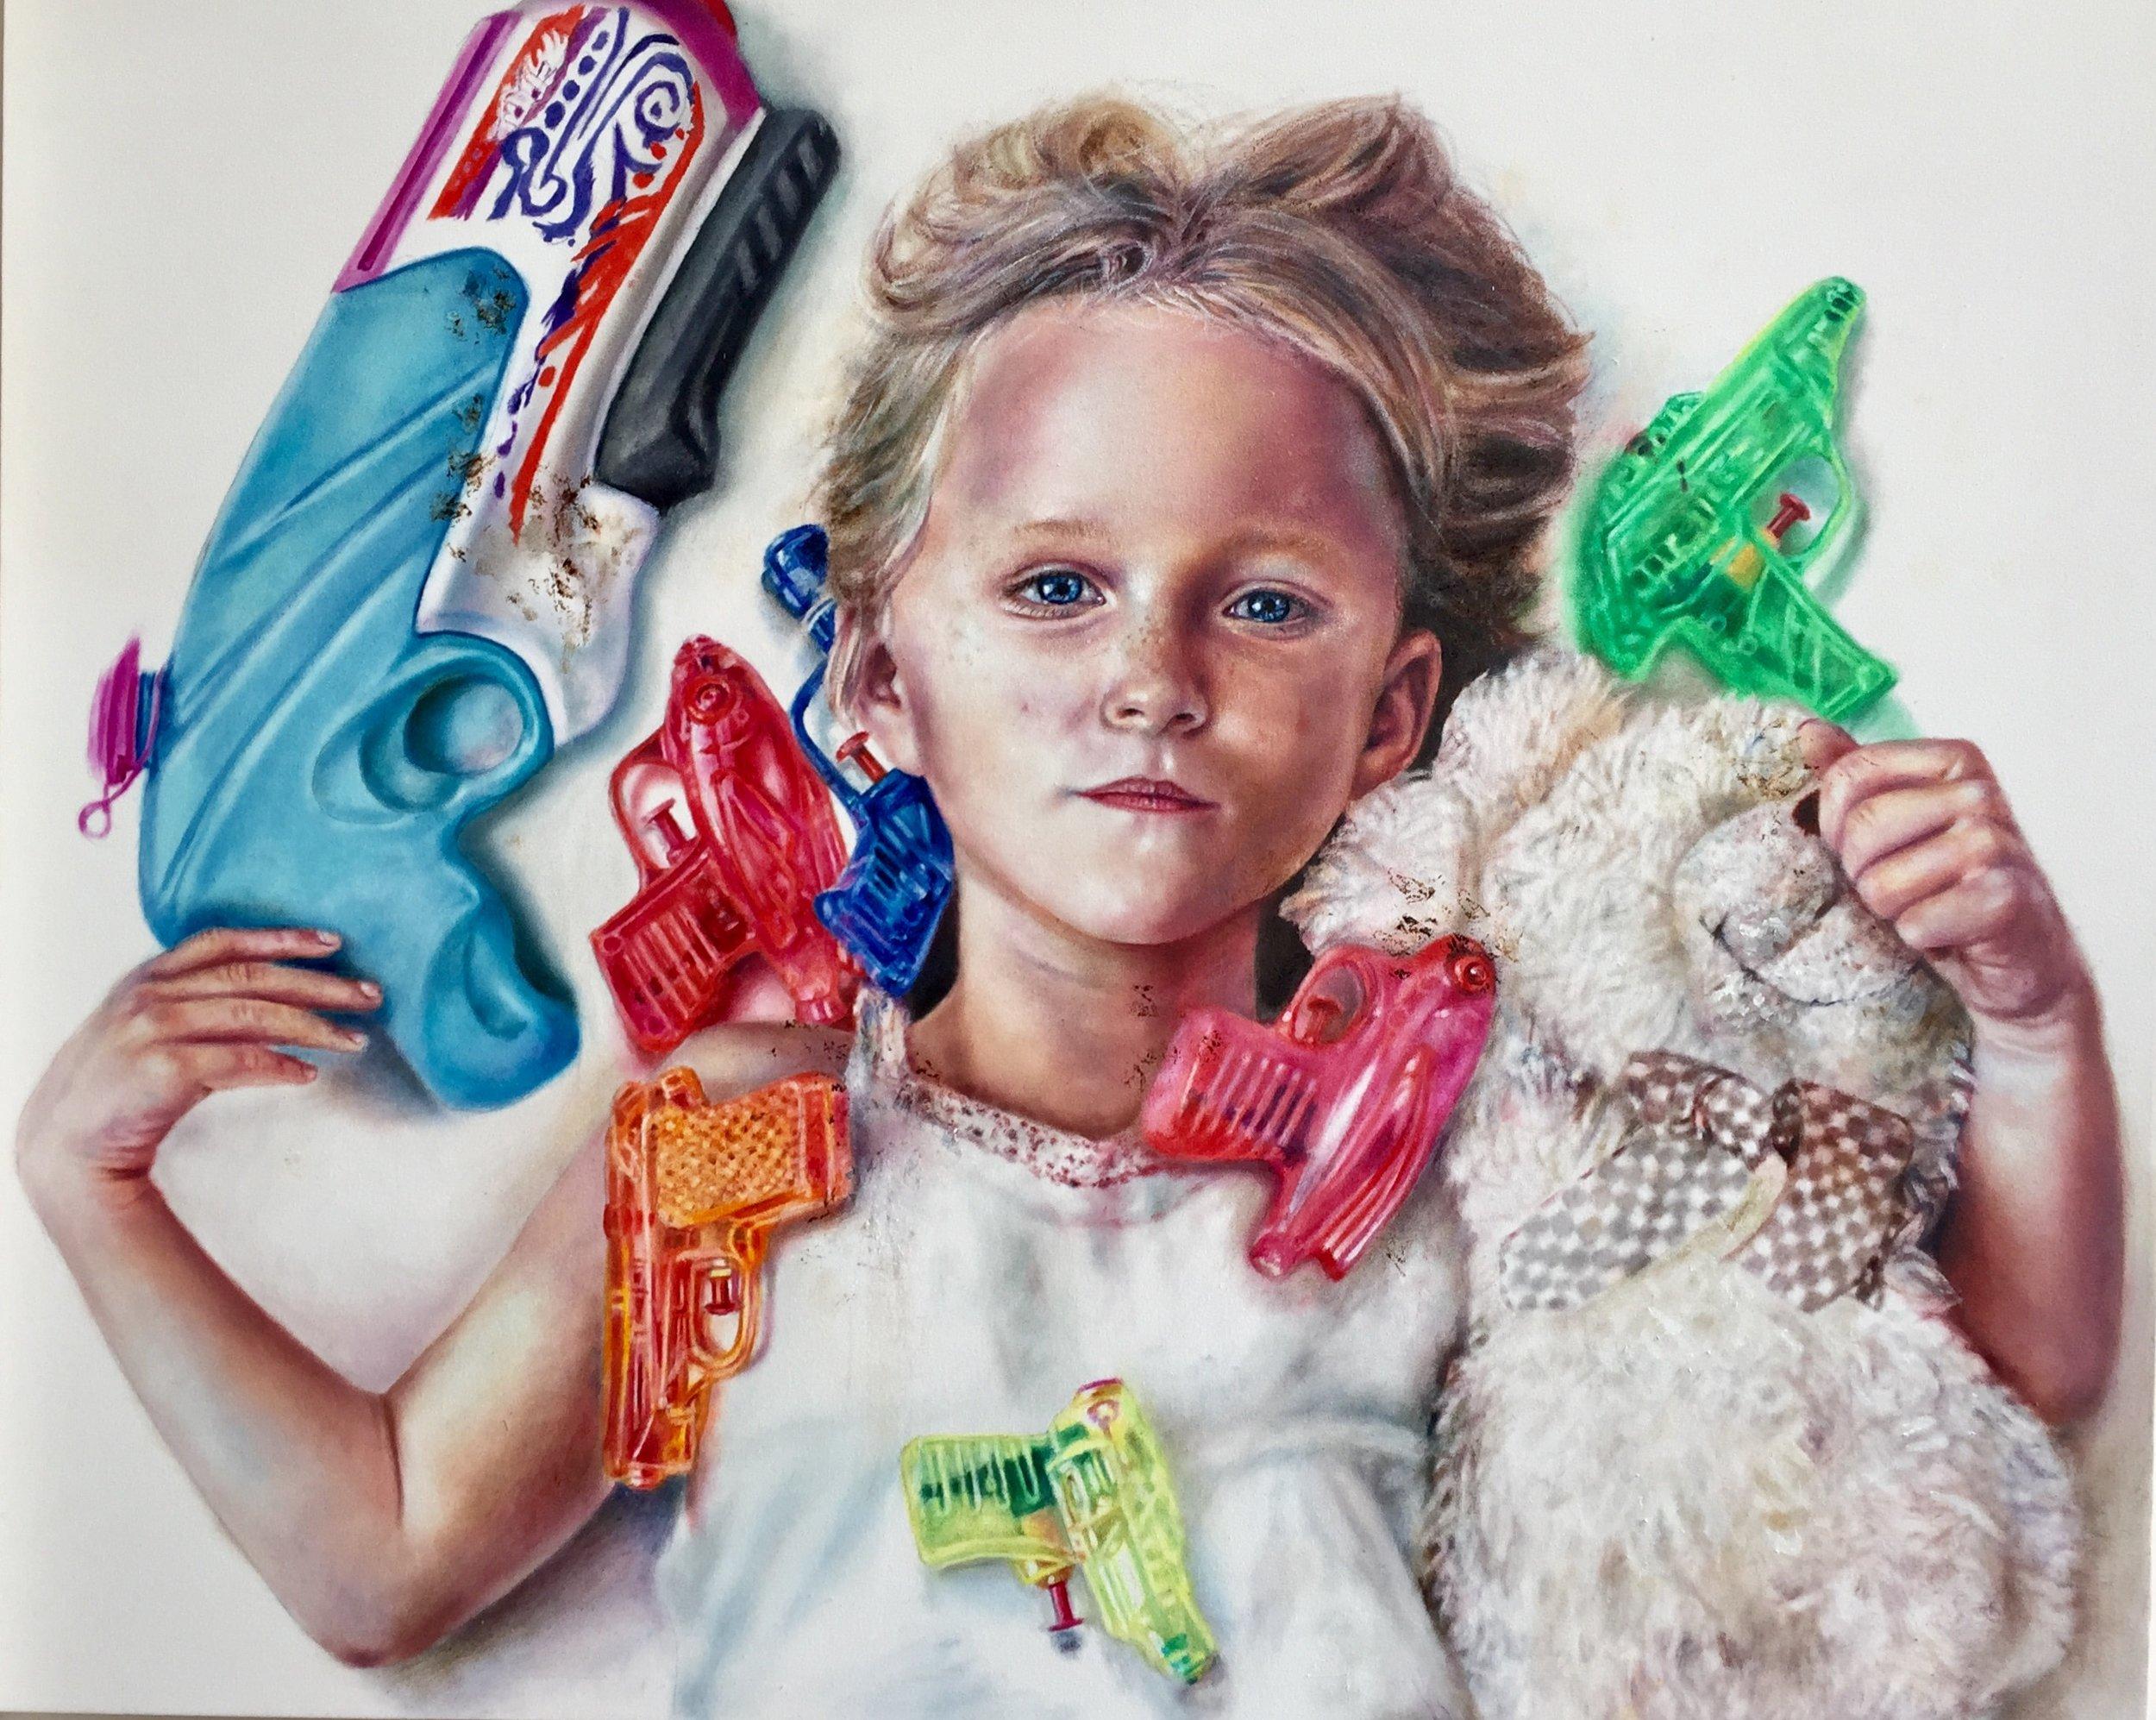 Toy Guns, Palm beach private collector